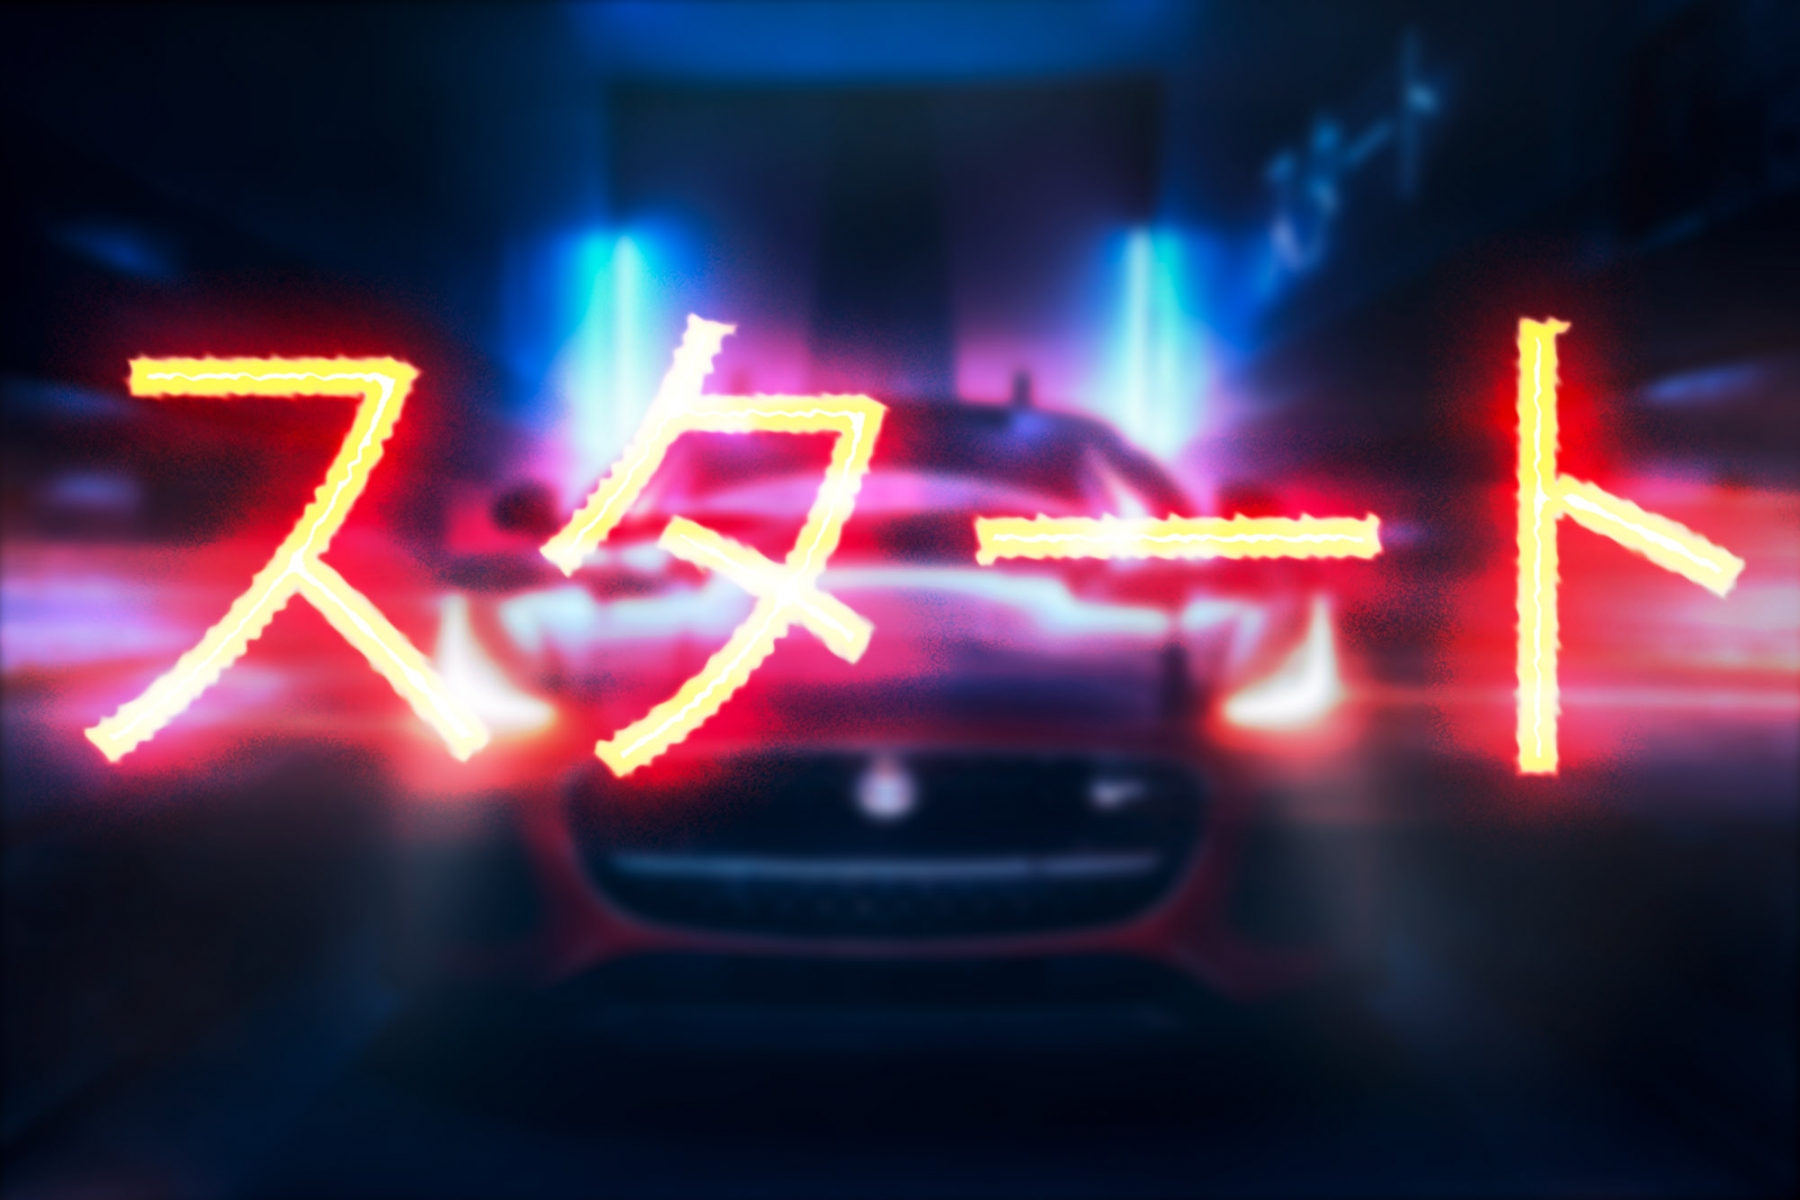 Jaguar_F_Type_Fahrstuhl_H1_typo_only_rgb